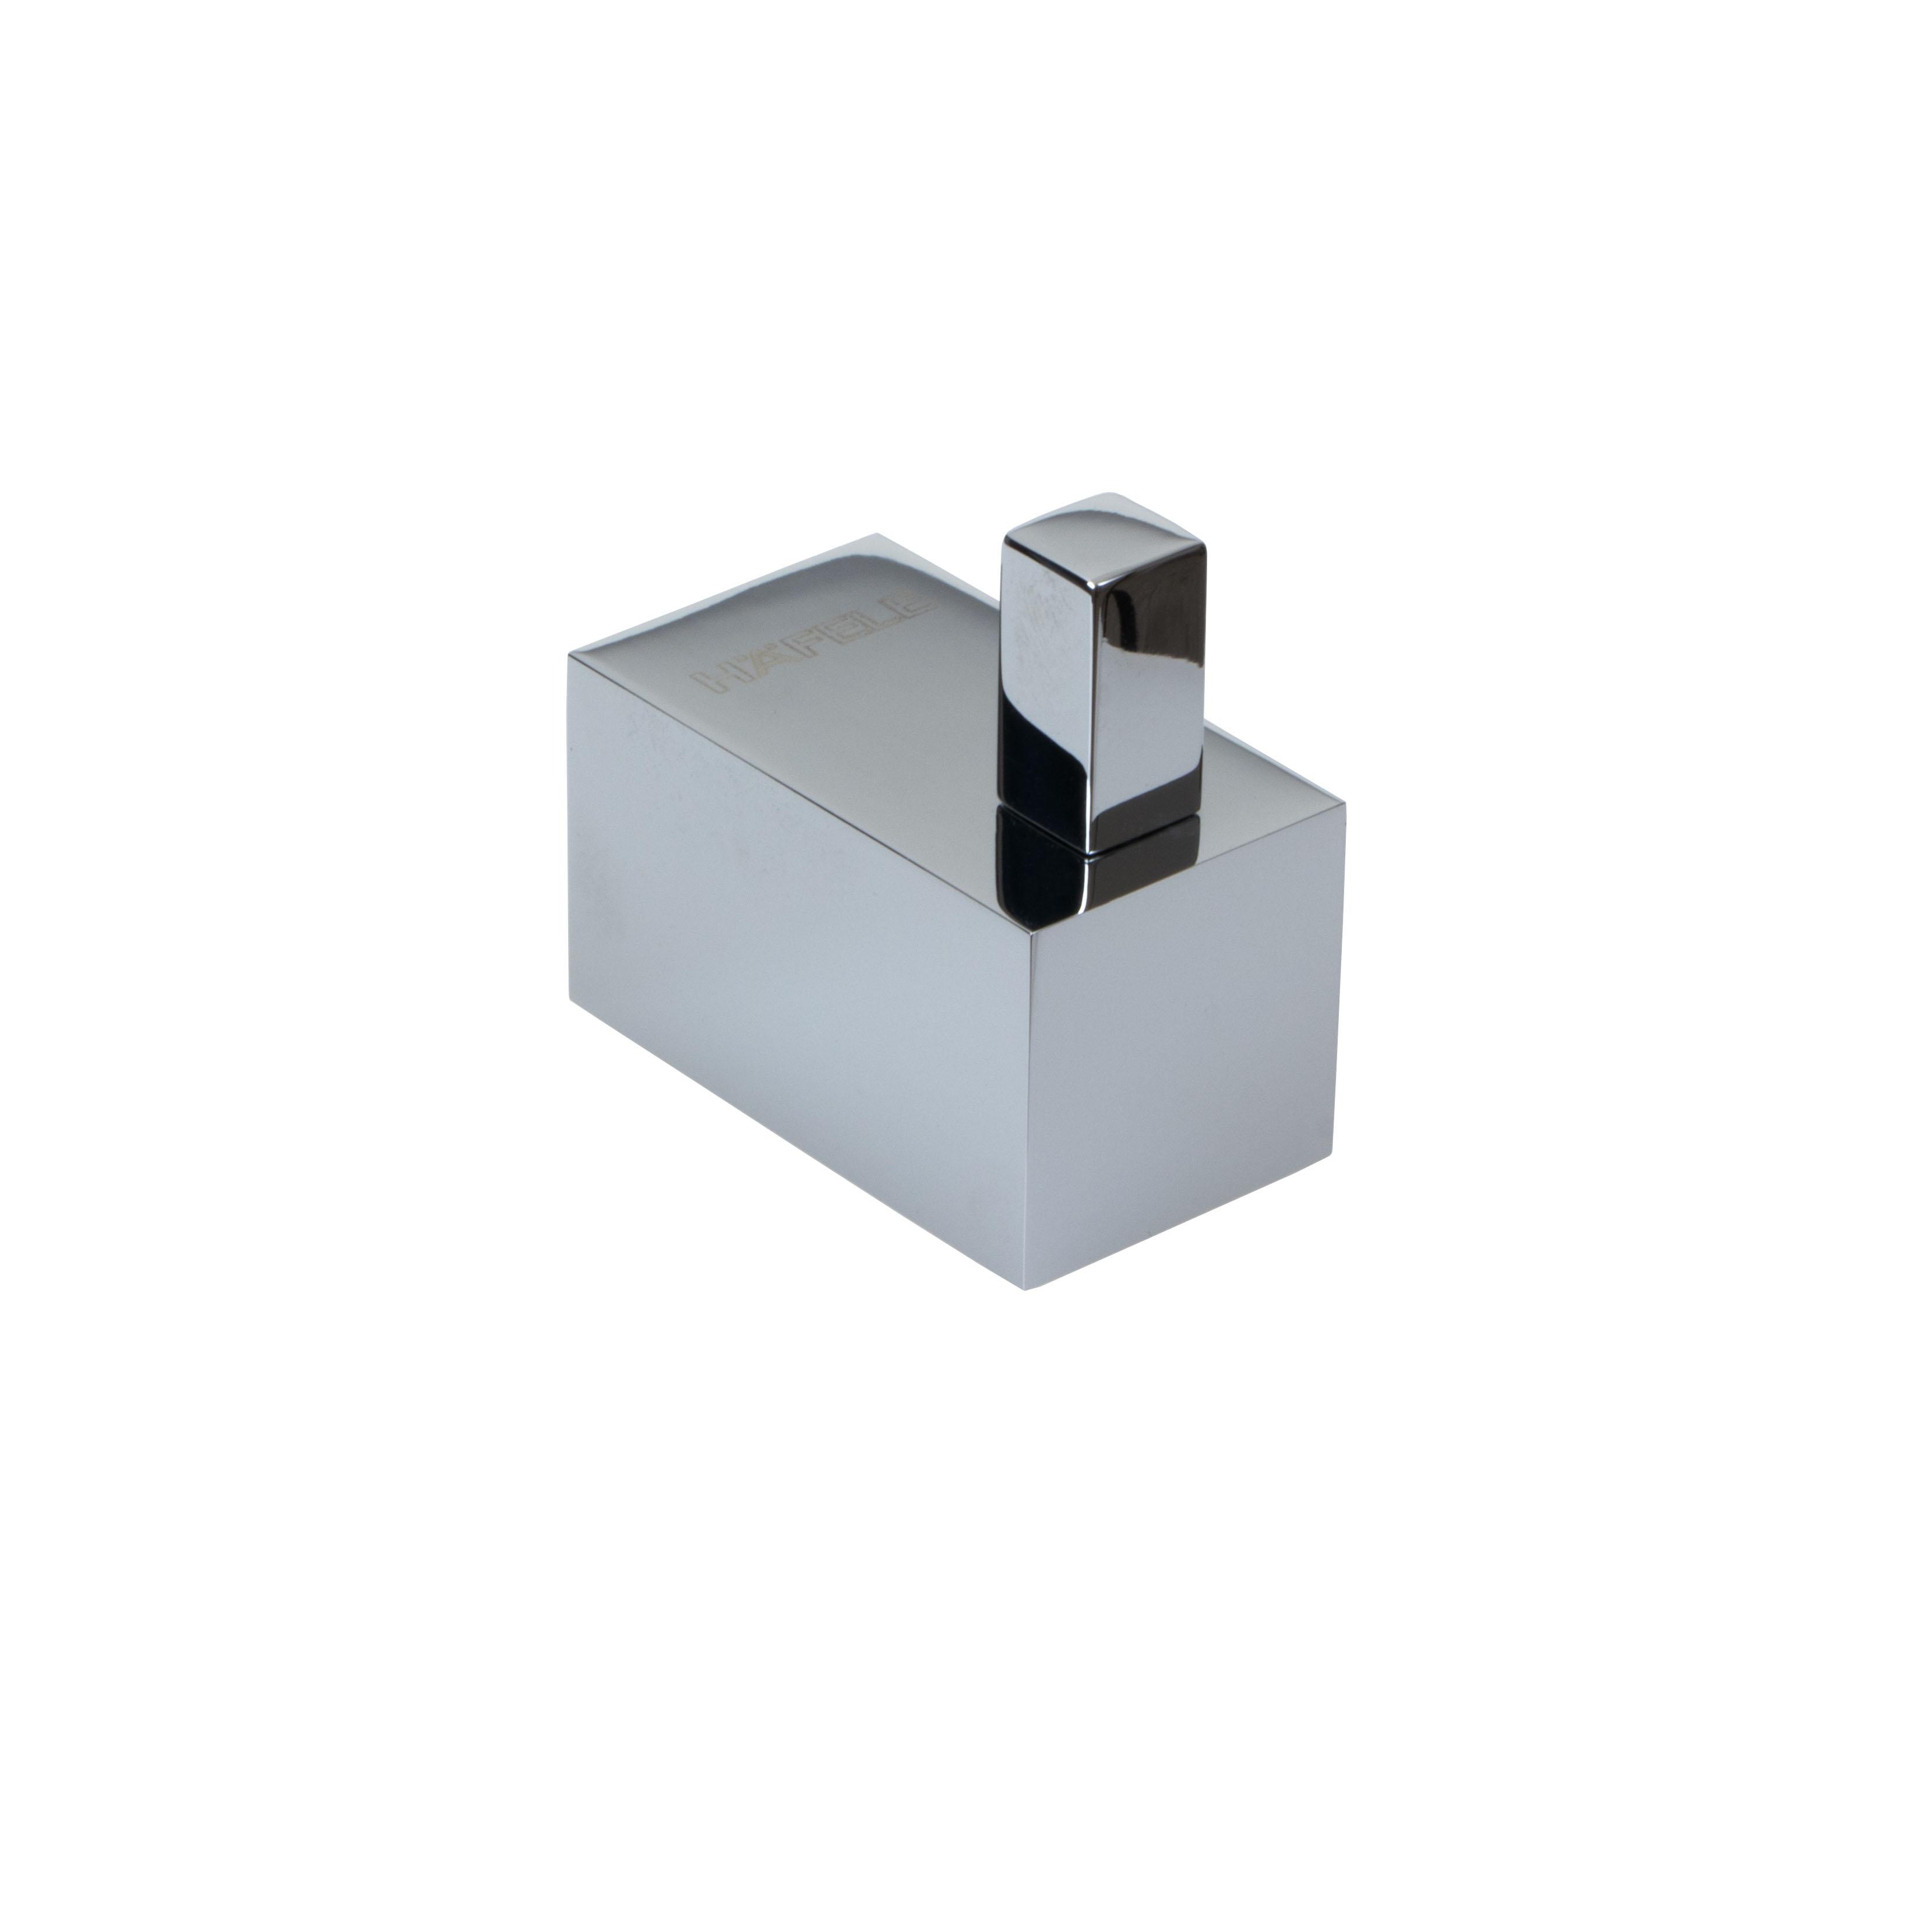 Häfele Handtuchhaken H2085 verchromt poliert eckig Messing Tiefe 38 mm